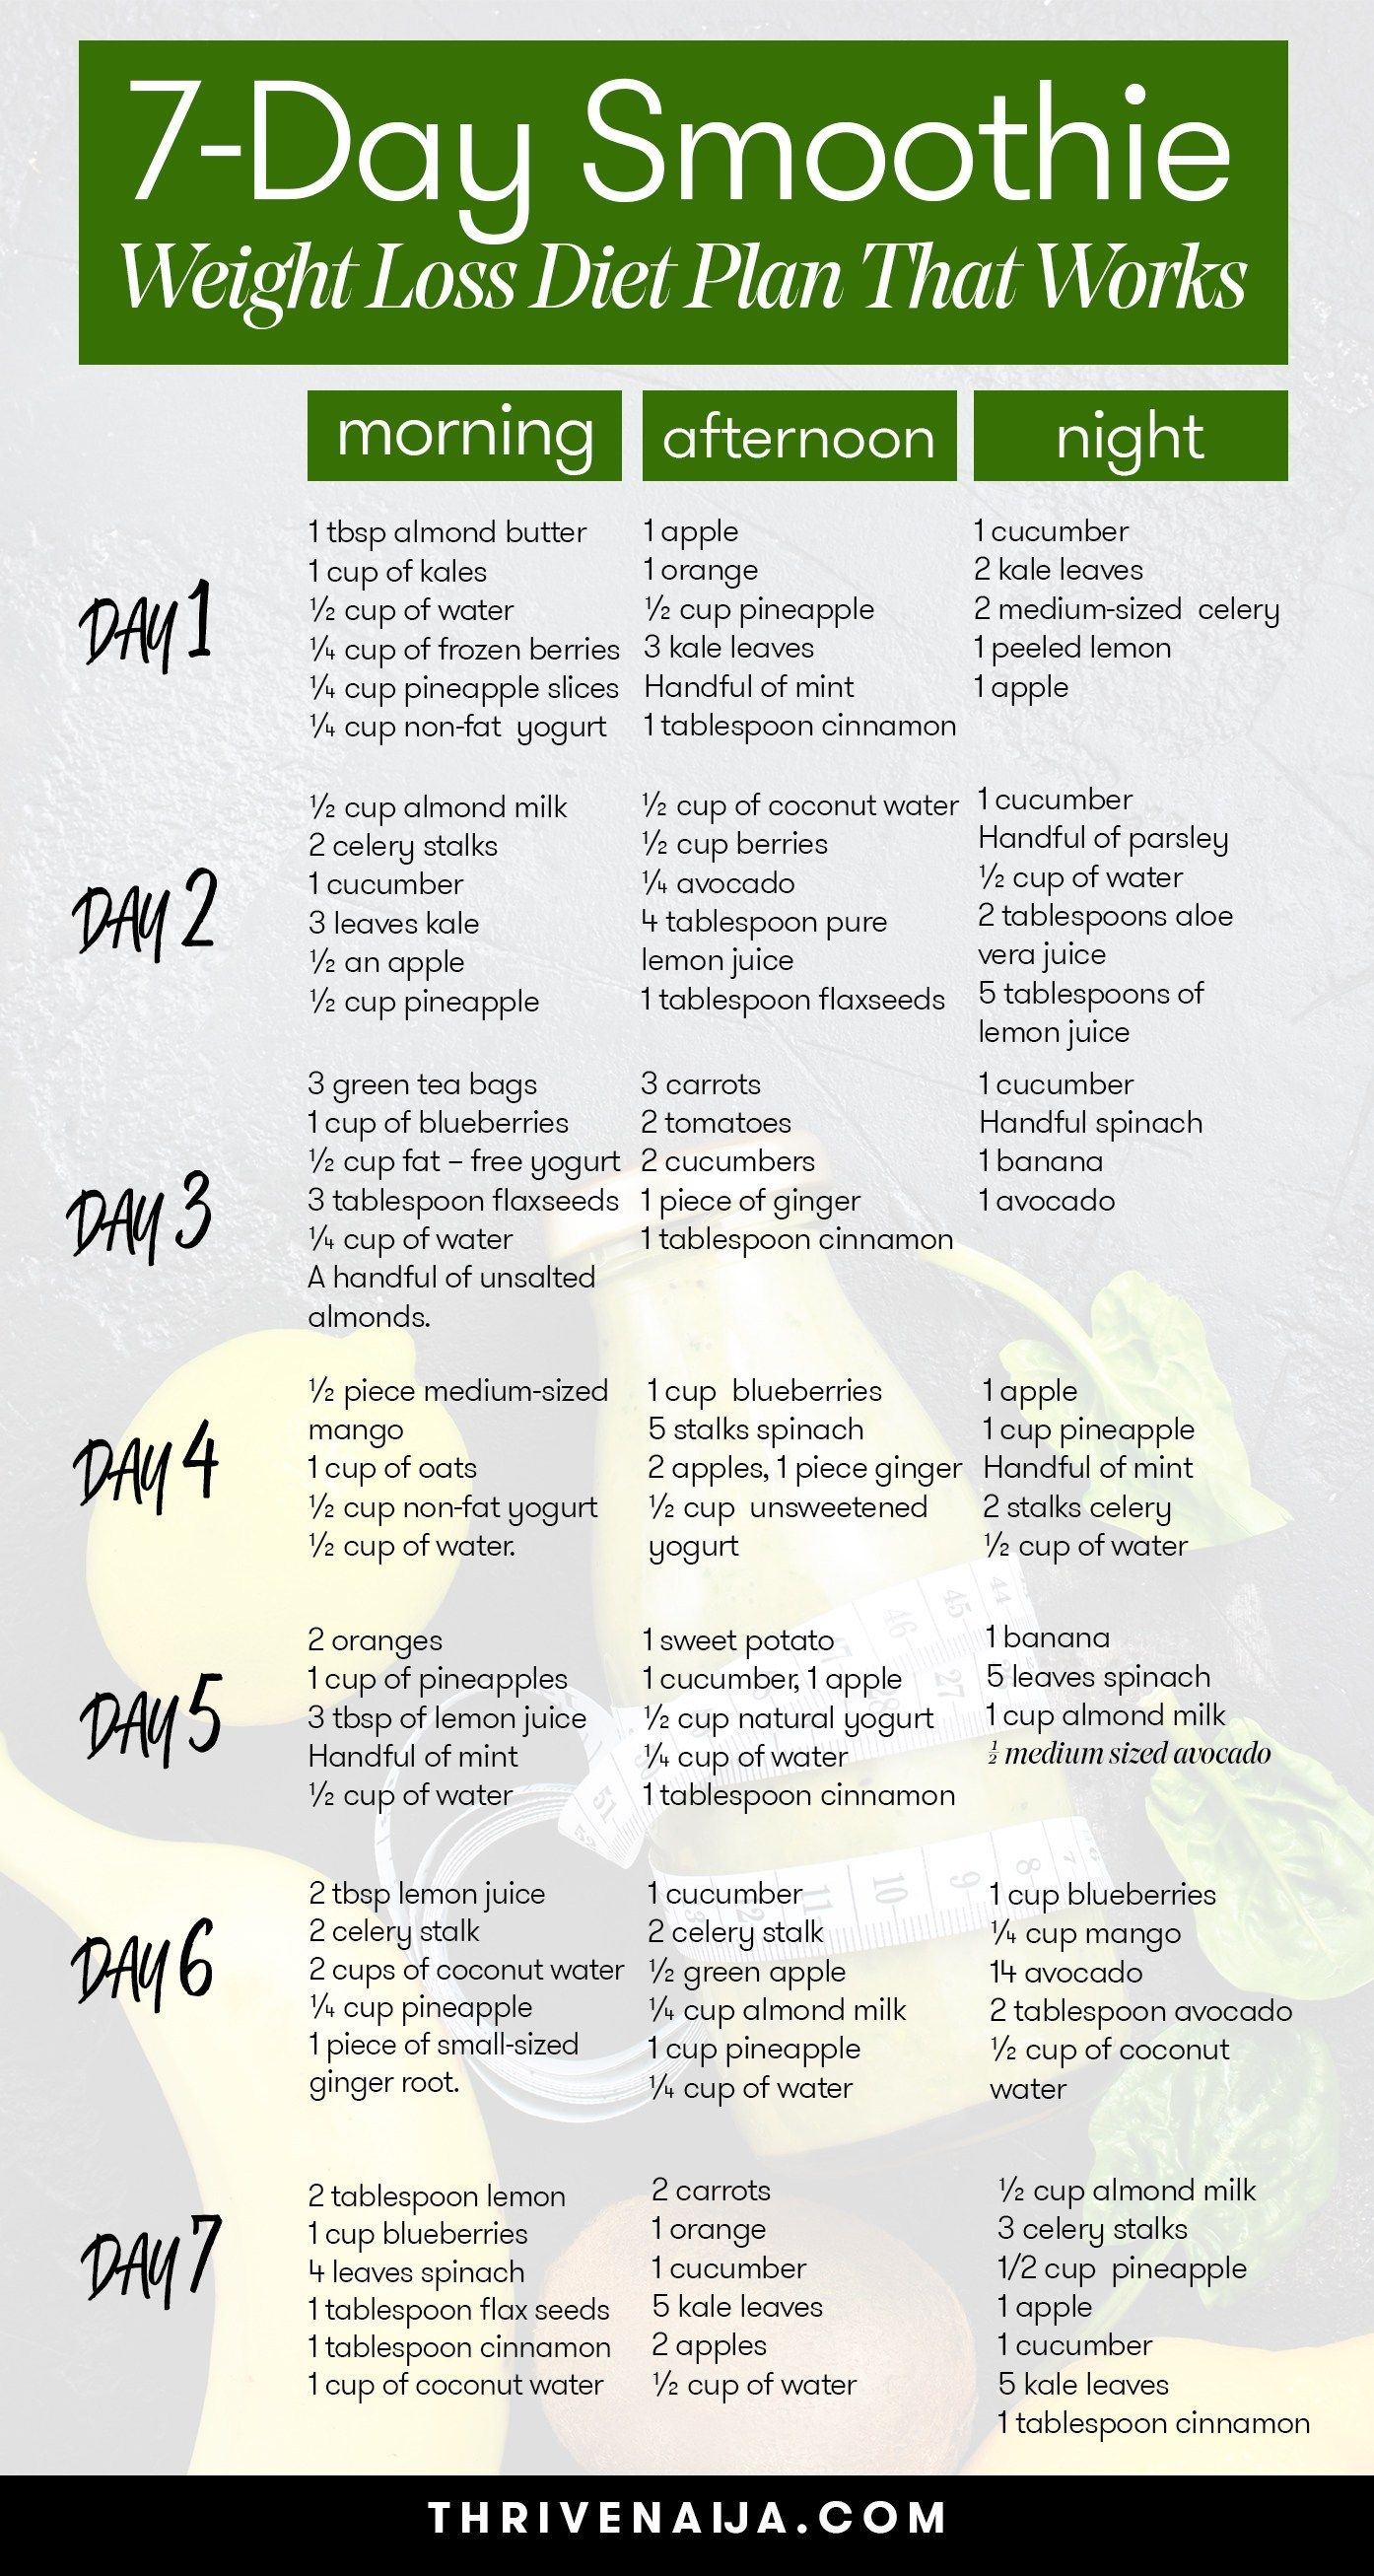 Photo of 7-Day Smoothie Weight Loss Diet Plan 2020 | ThriveNaija